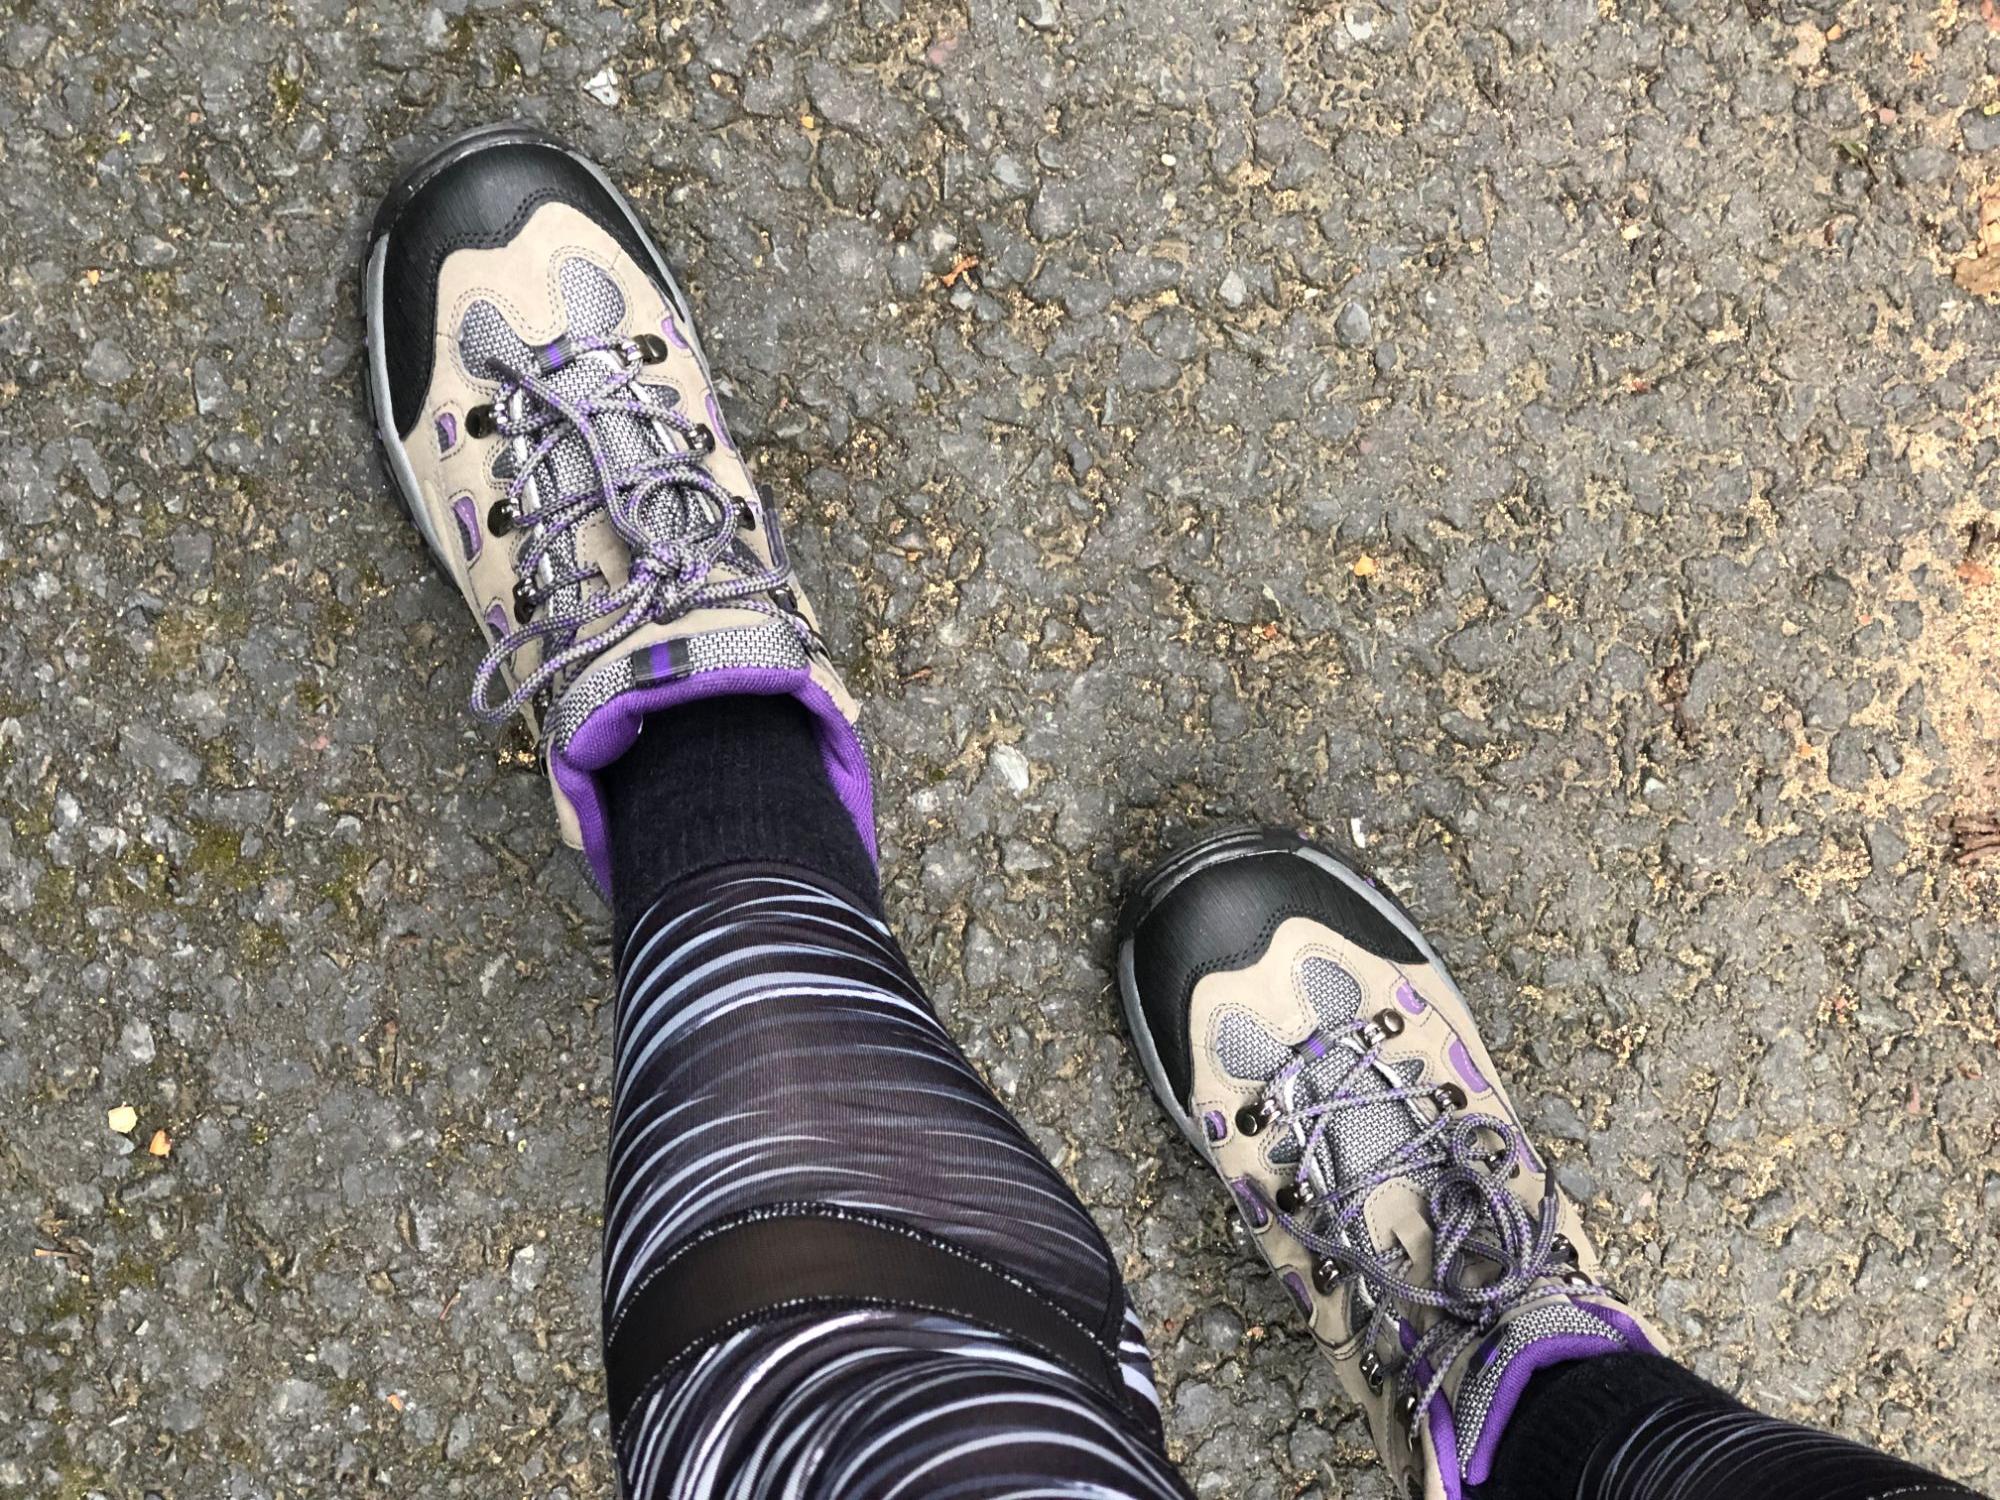 free stock image photo hiking boots walking